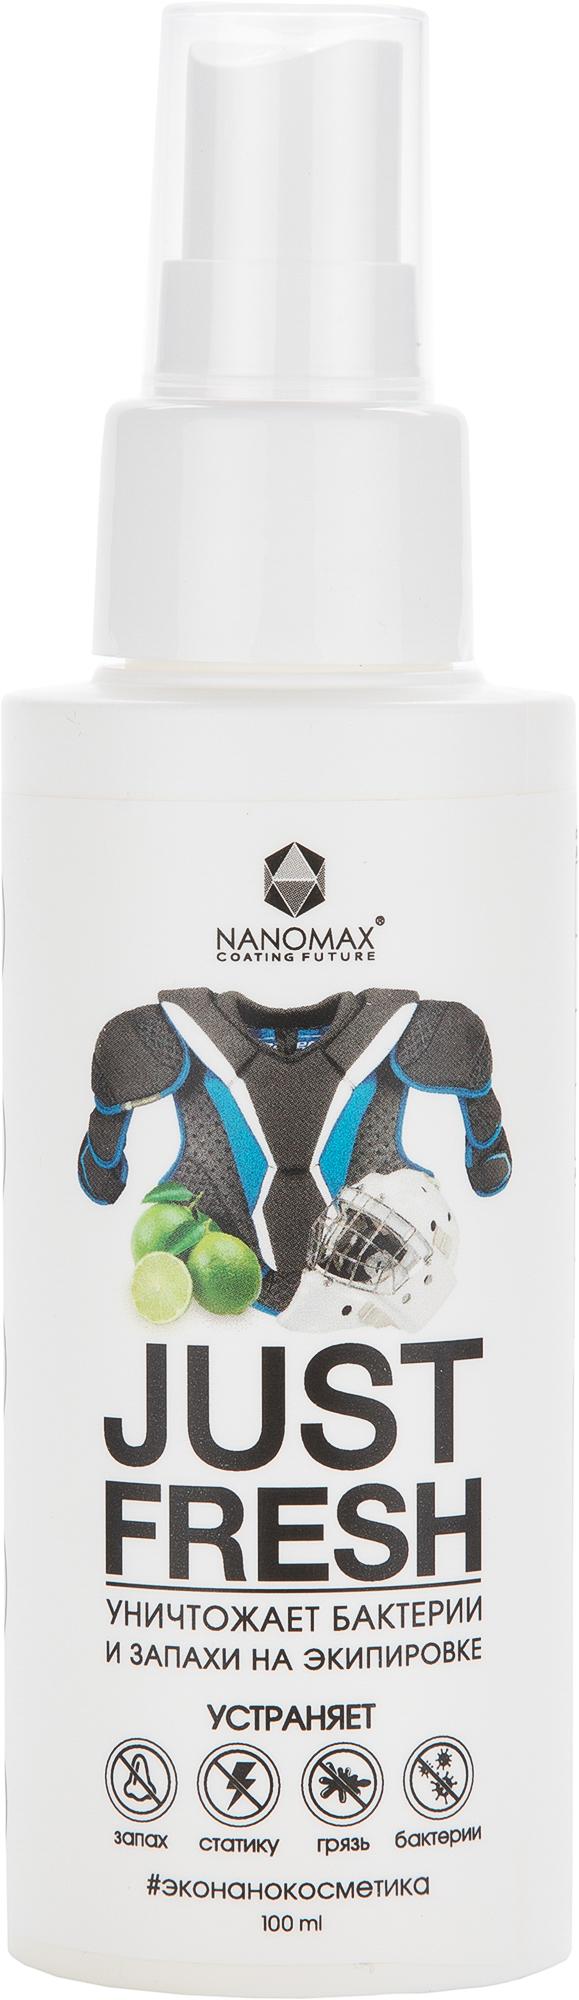 Nanomax Средство уничтожающее бактерии и запахи на экипировке Just Fresh